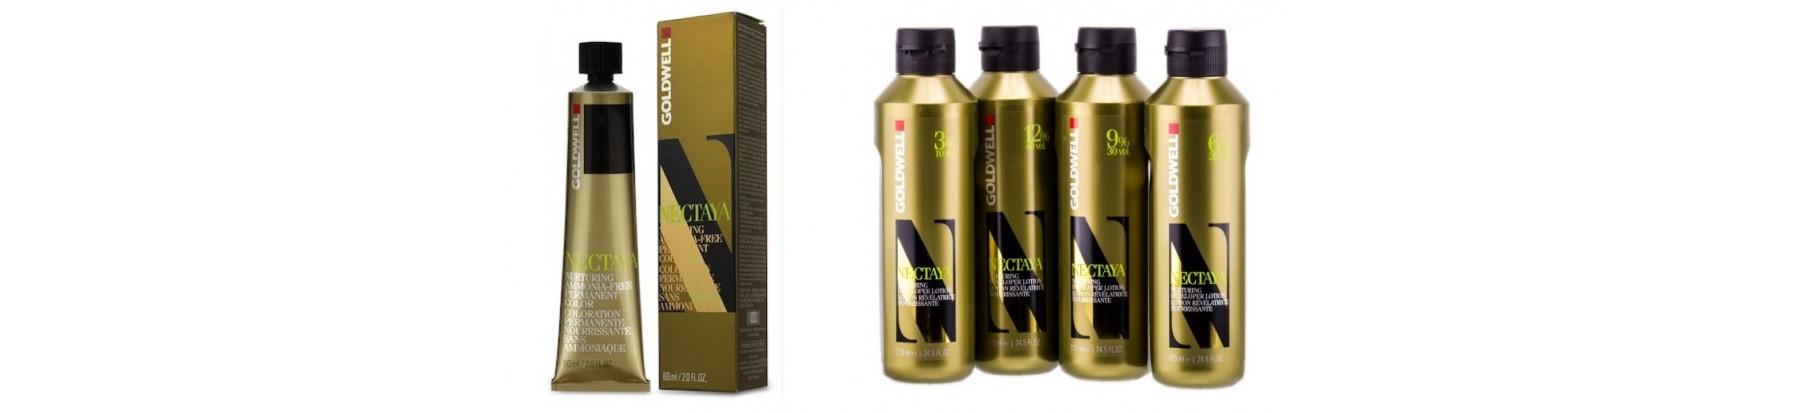 NECTAYA - стойкая краска для волос без аммиака тюбики, (60 мл.)